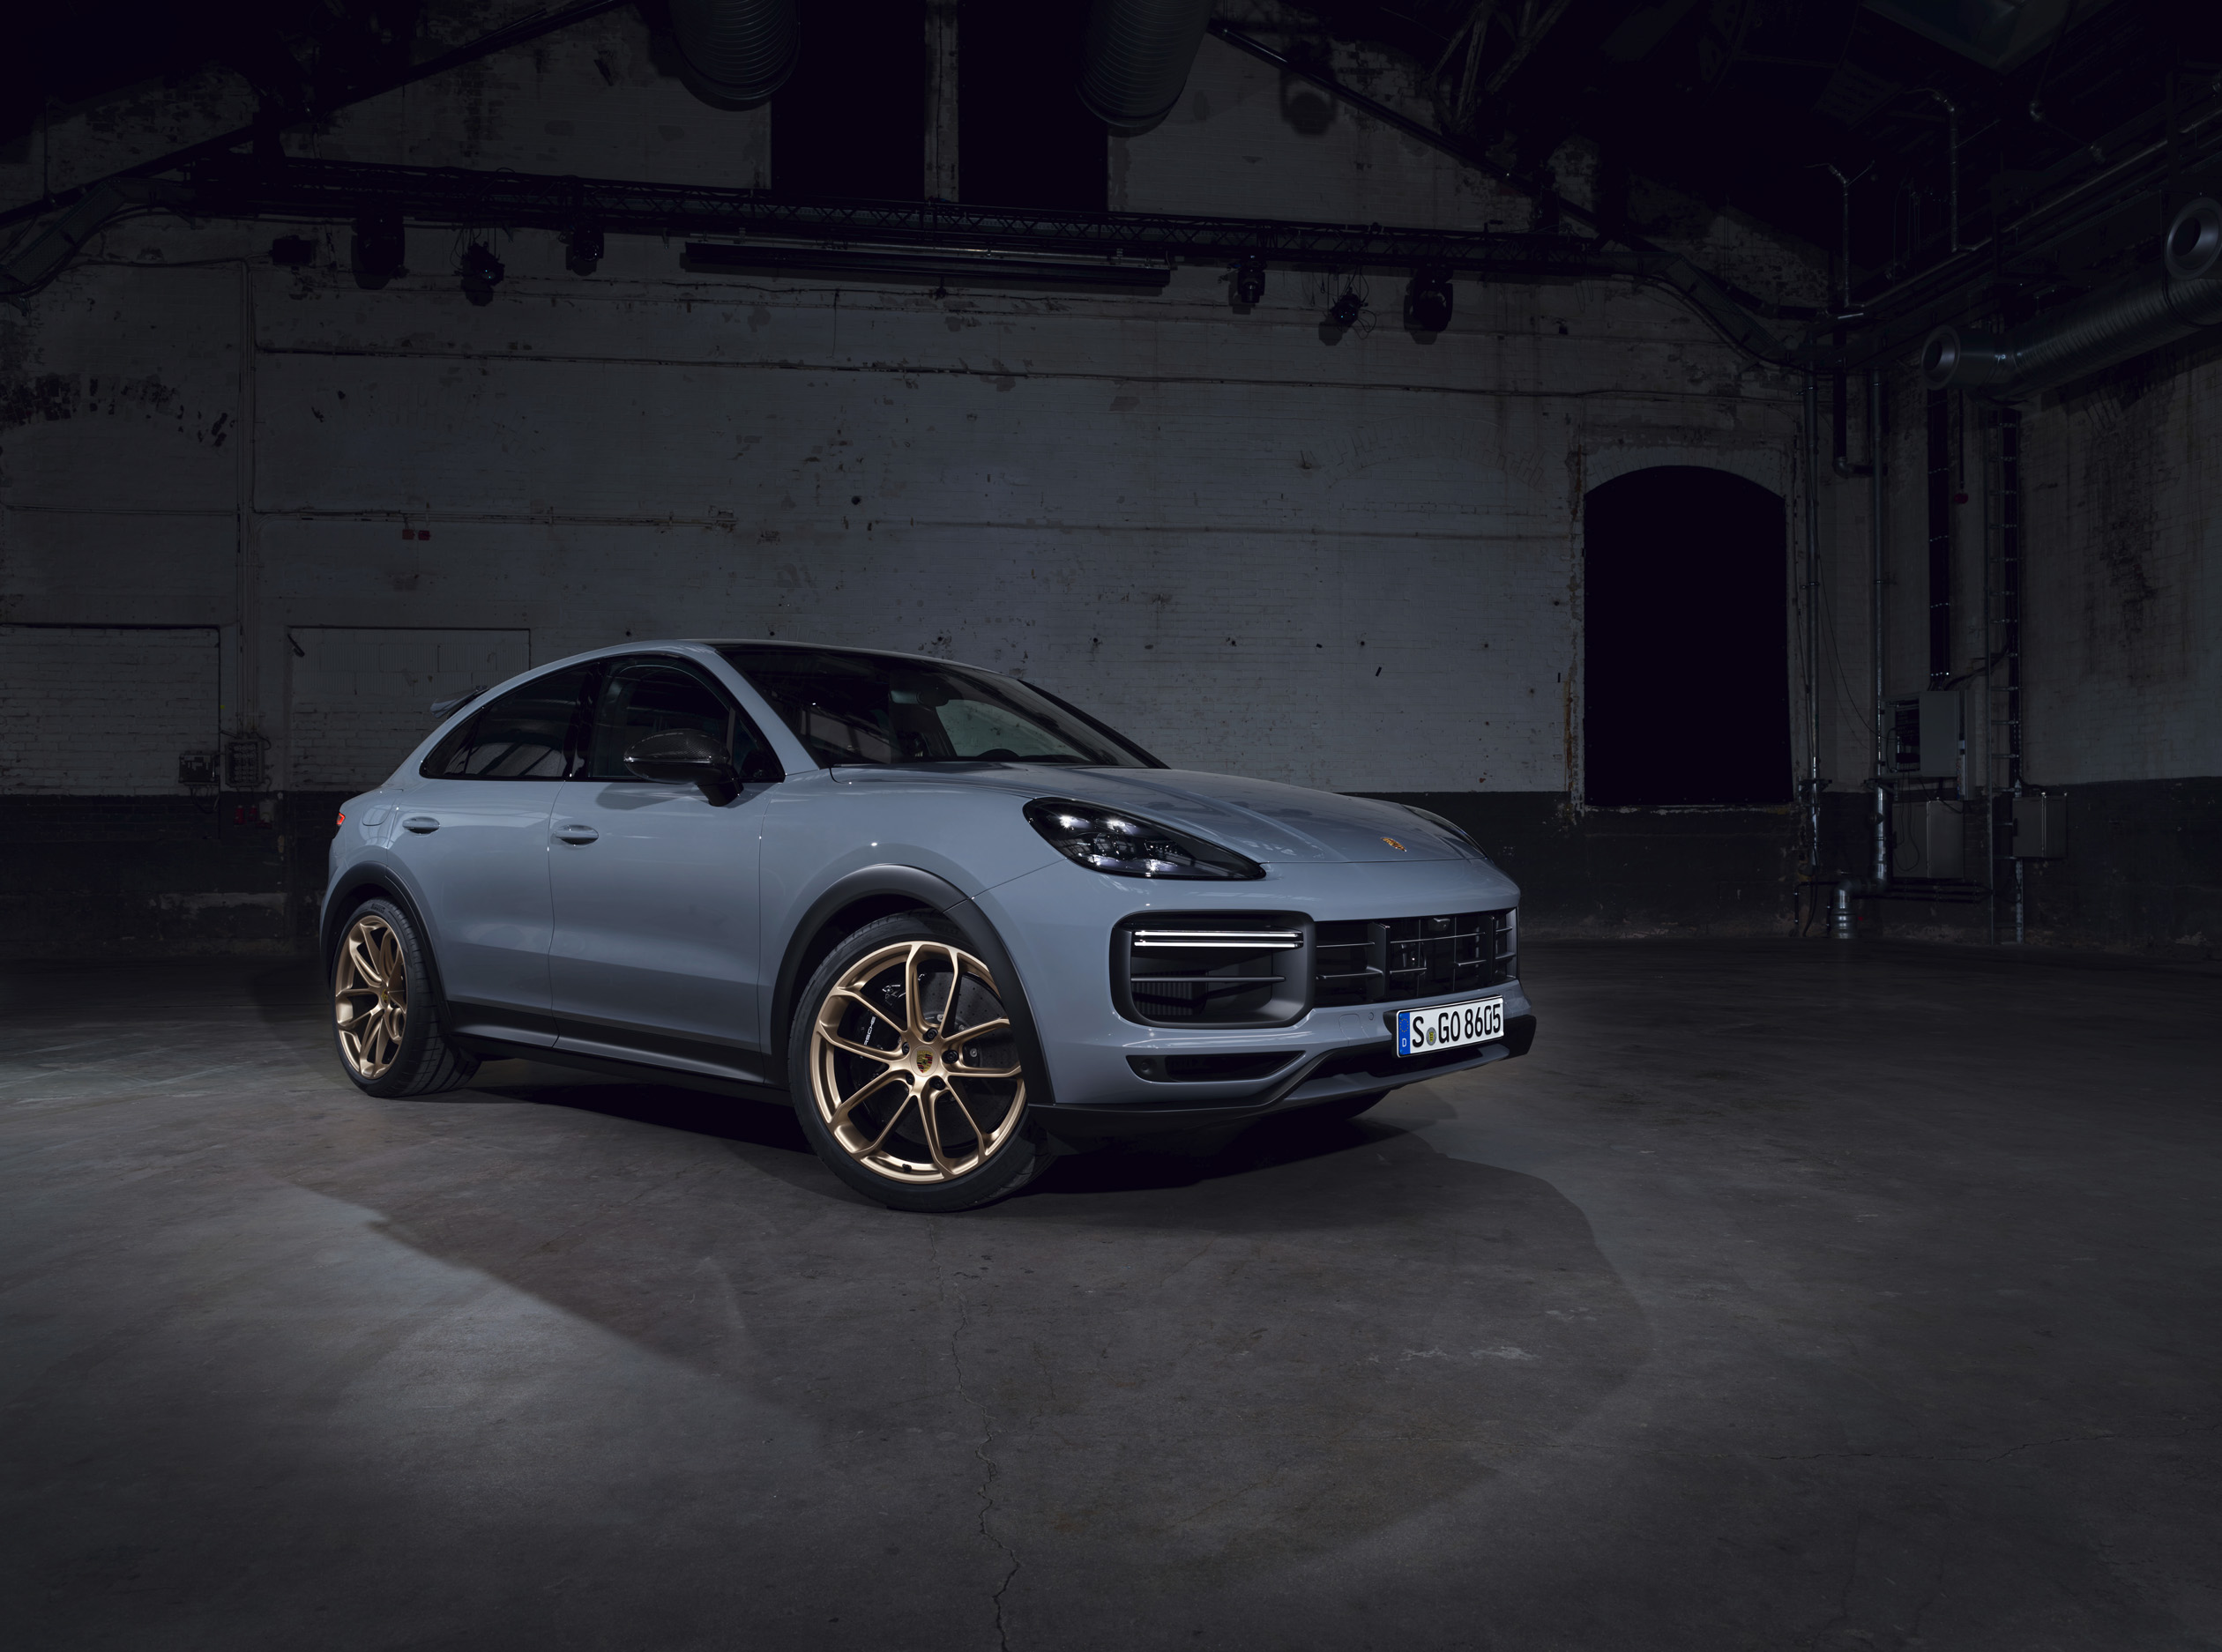 Porsche Cayenne Turbo GT, a punto para el máximo rendimiento